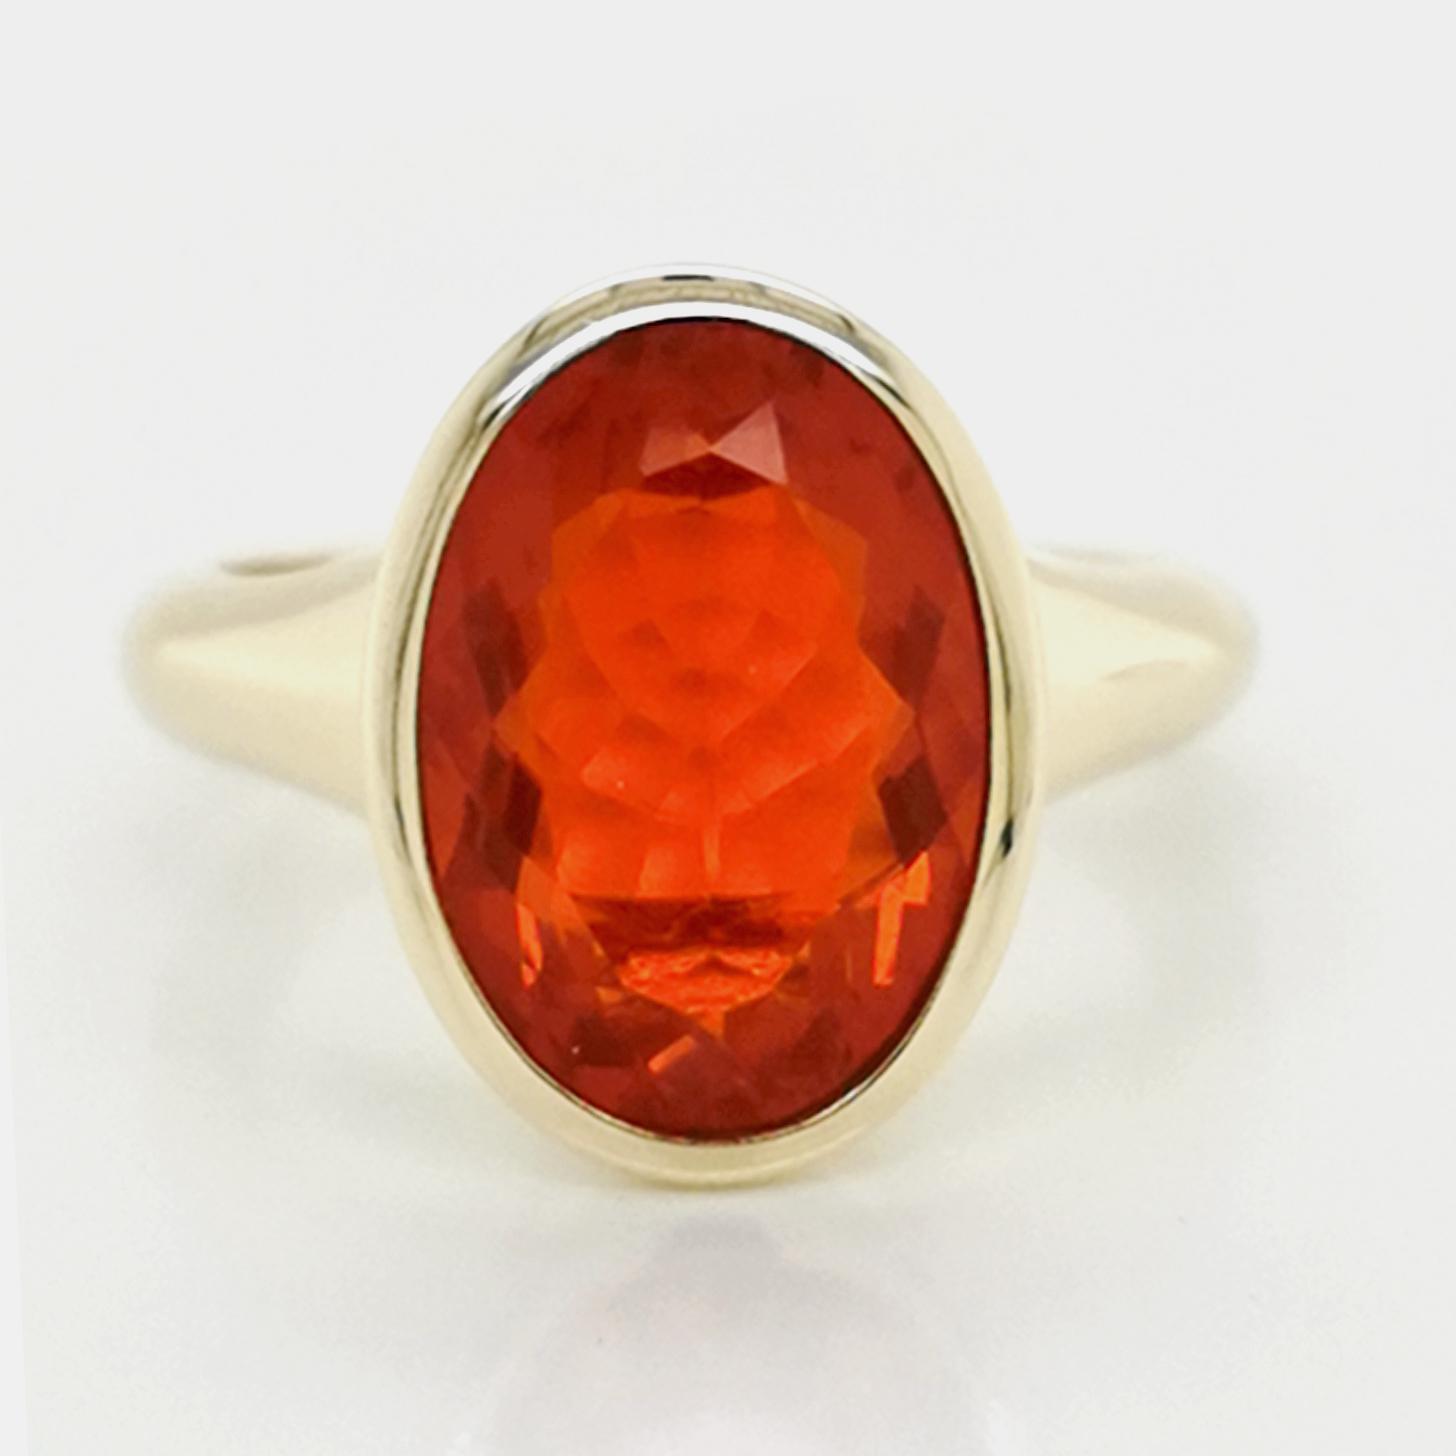 Cherryopal, rot, facettiert, ca. 2,6 ct Edelstein Ring Gelbgold 585/000 Sogni d´oro